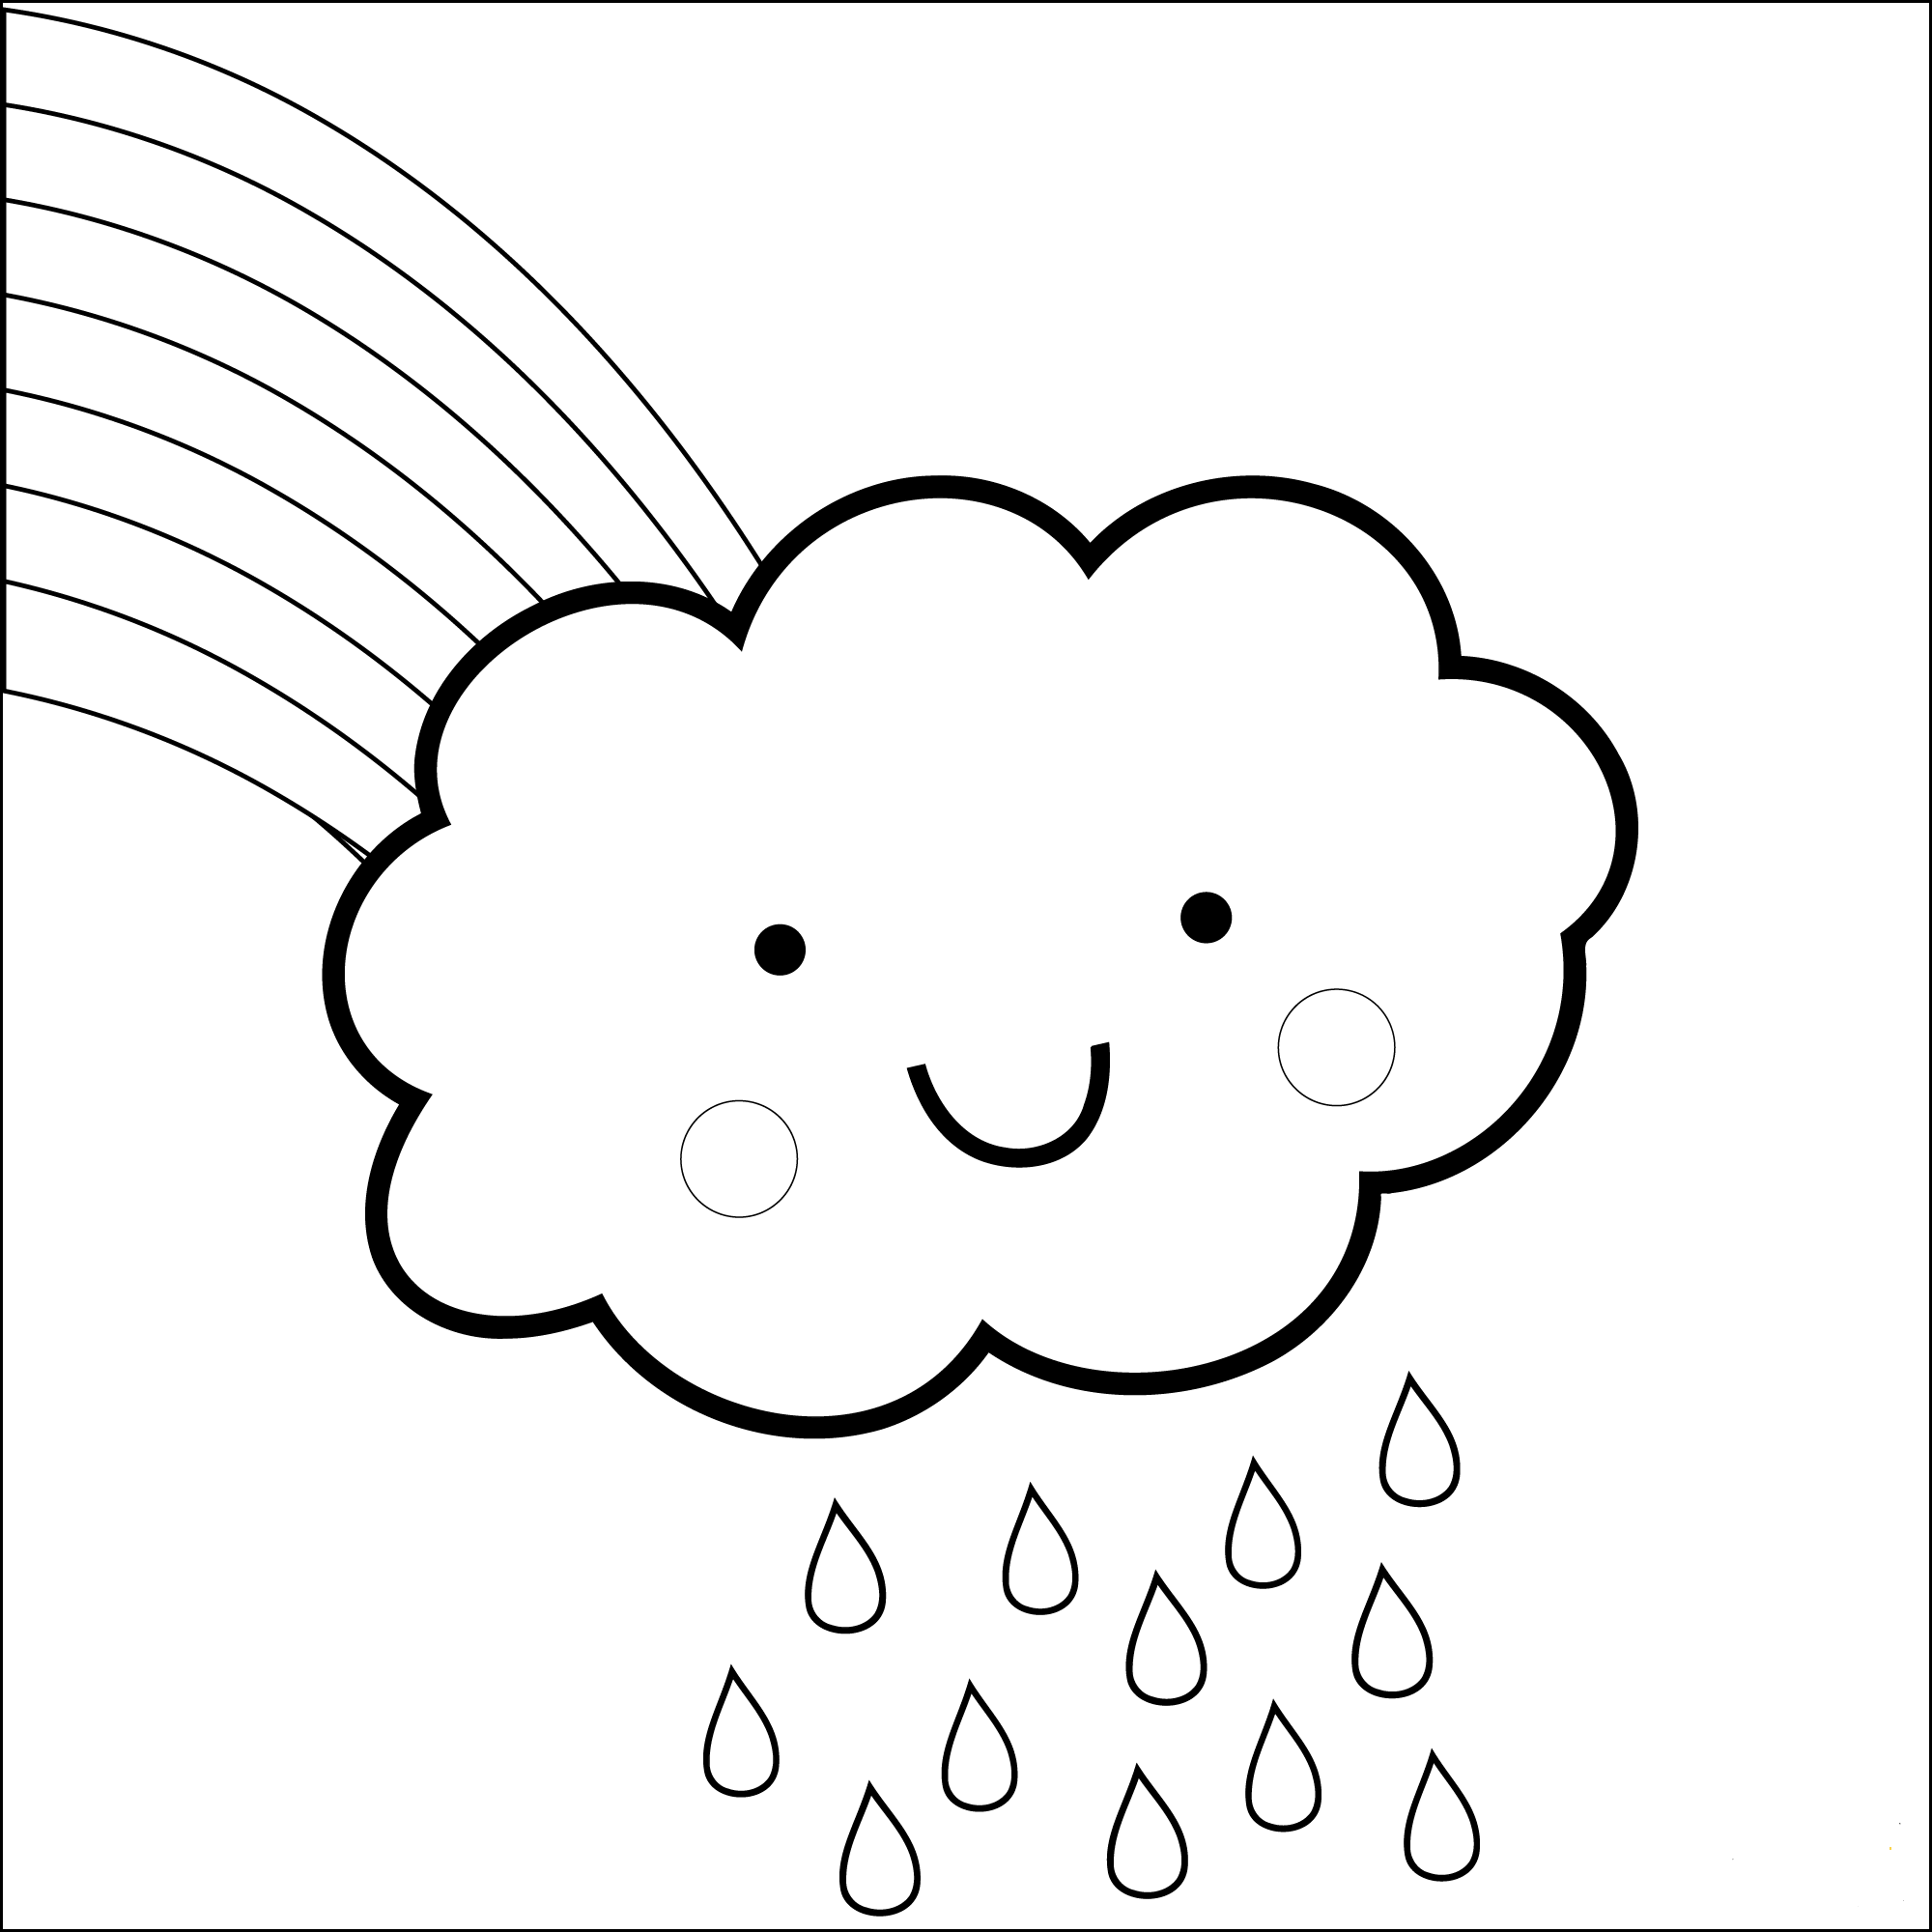 Rainbow and kawaii cloud